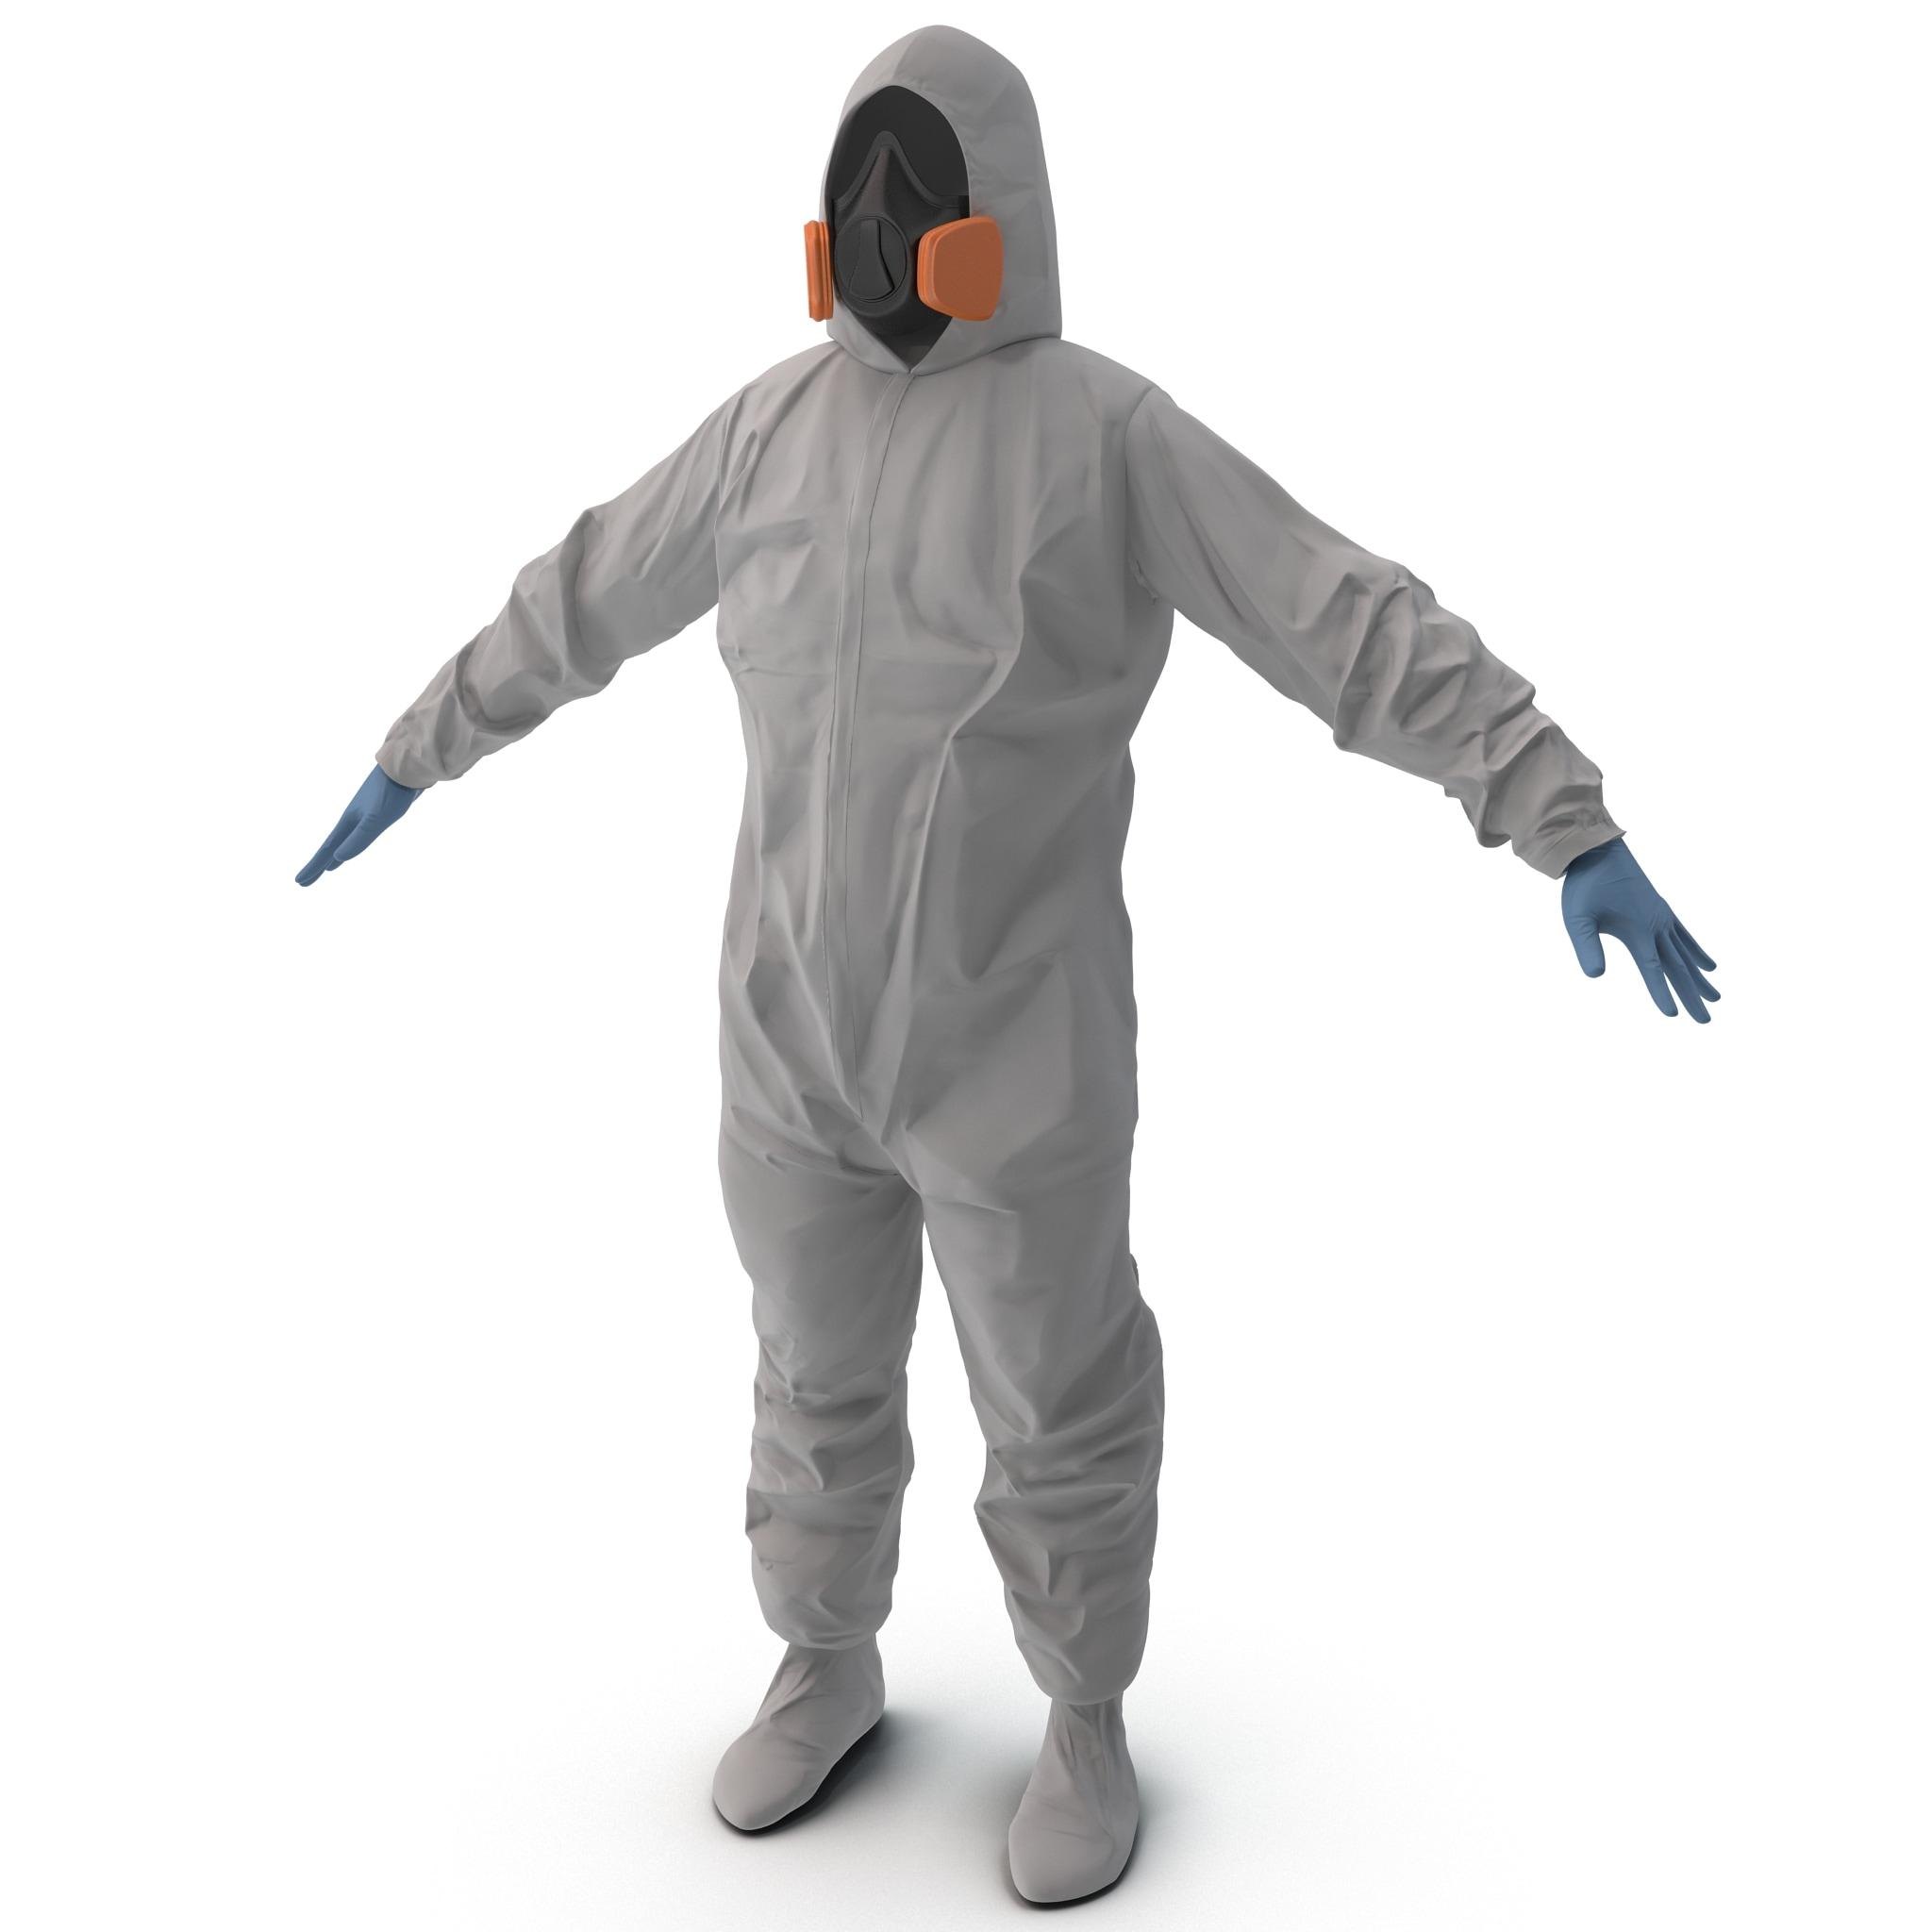 000_Hazmat_Worker_Clothes.jpg